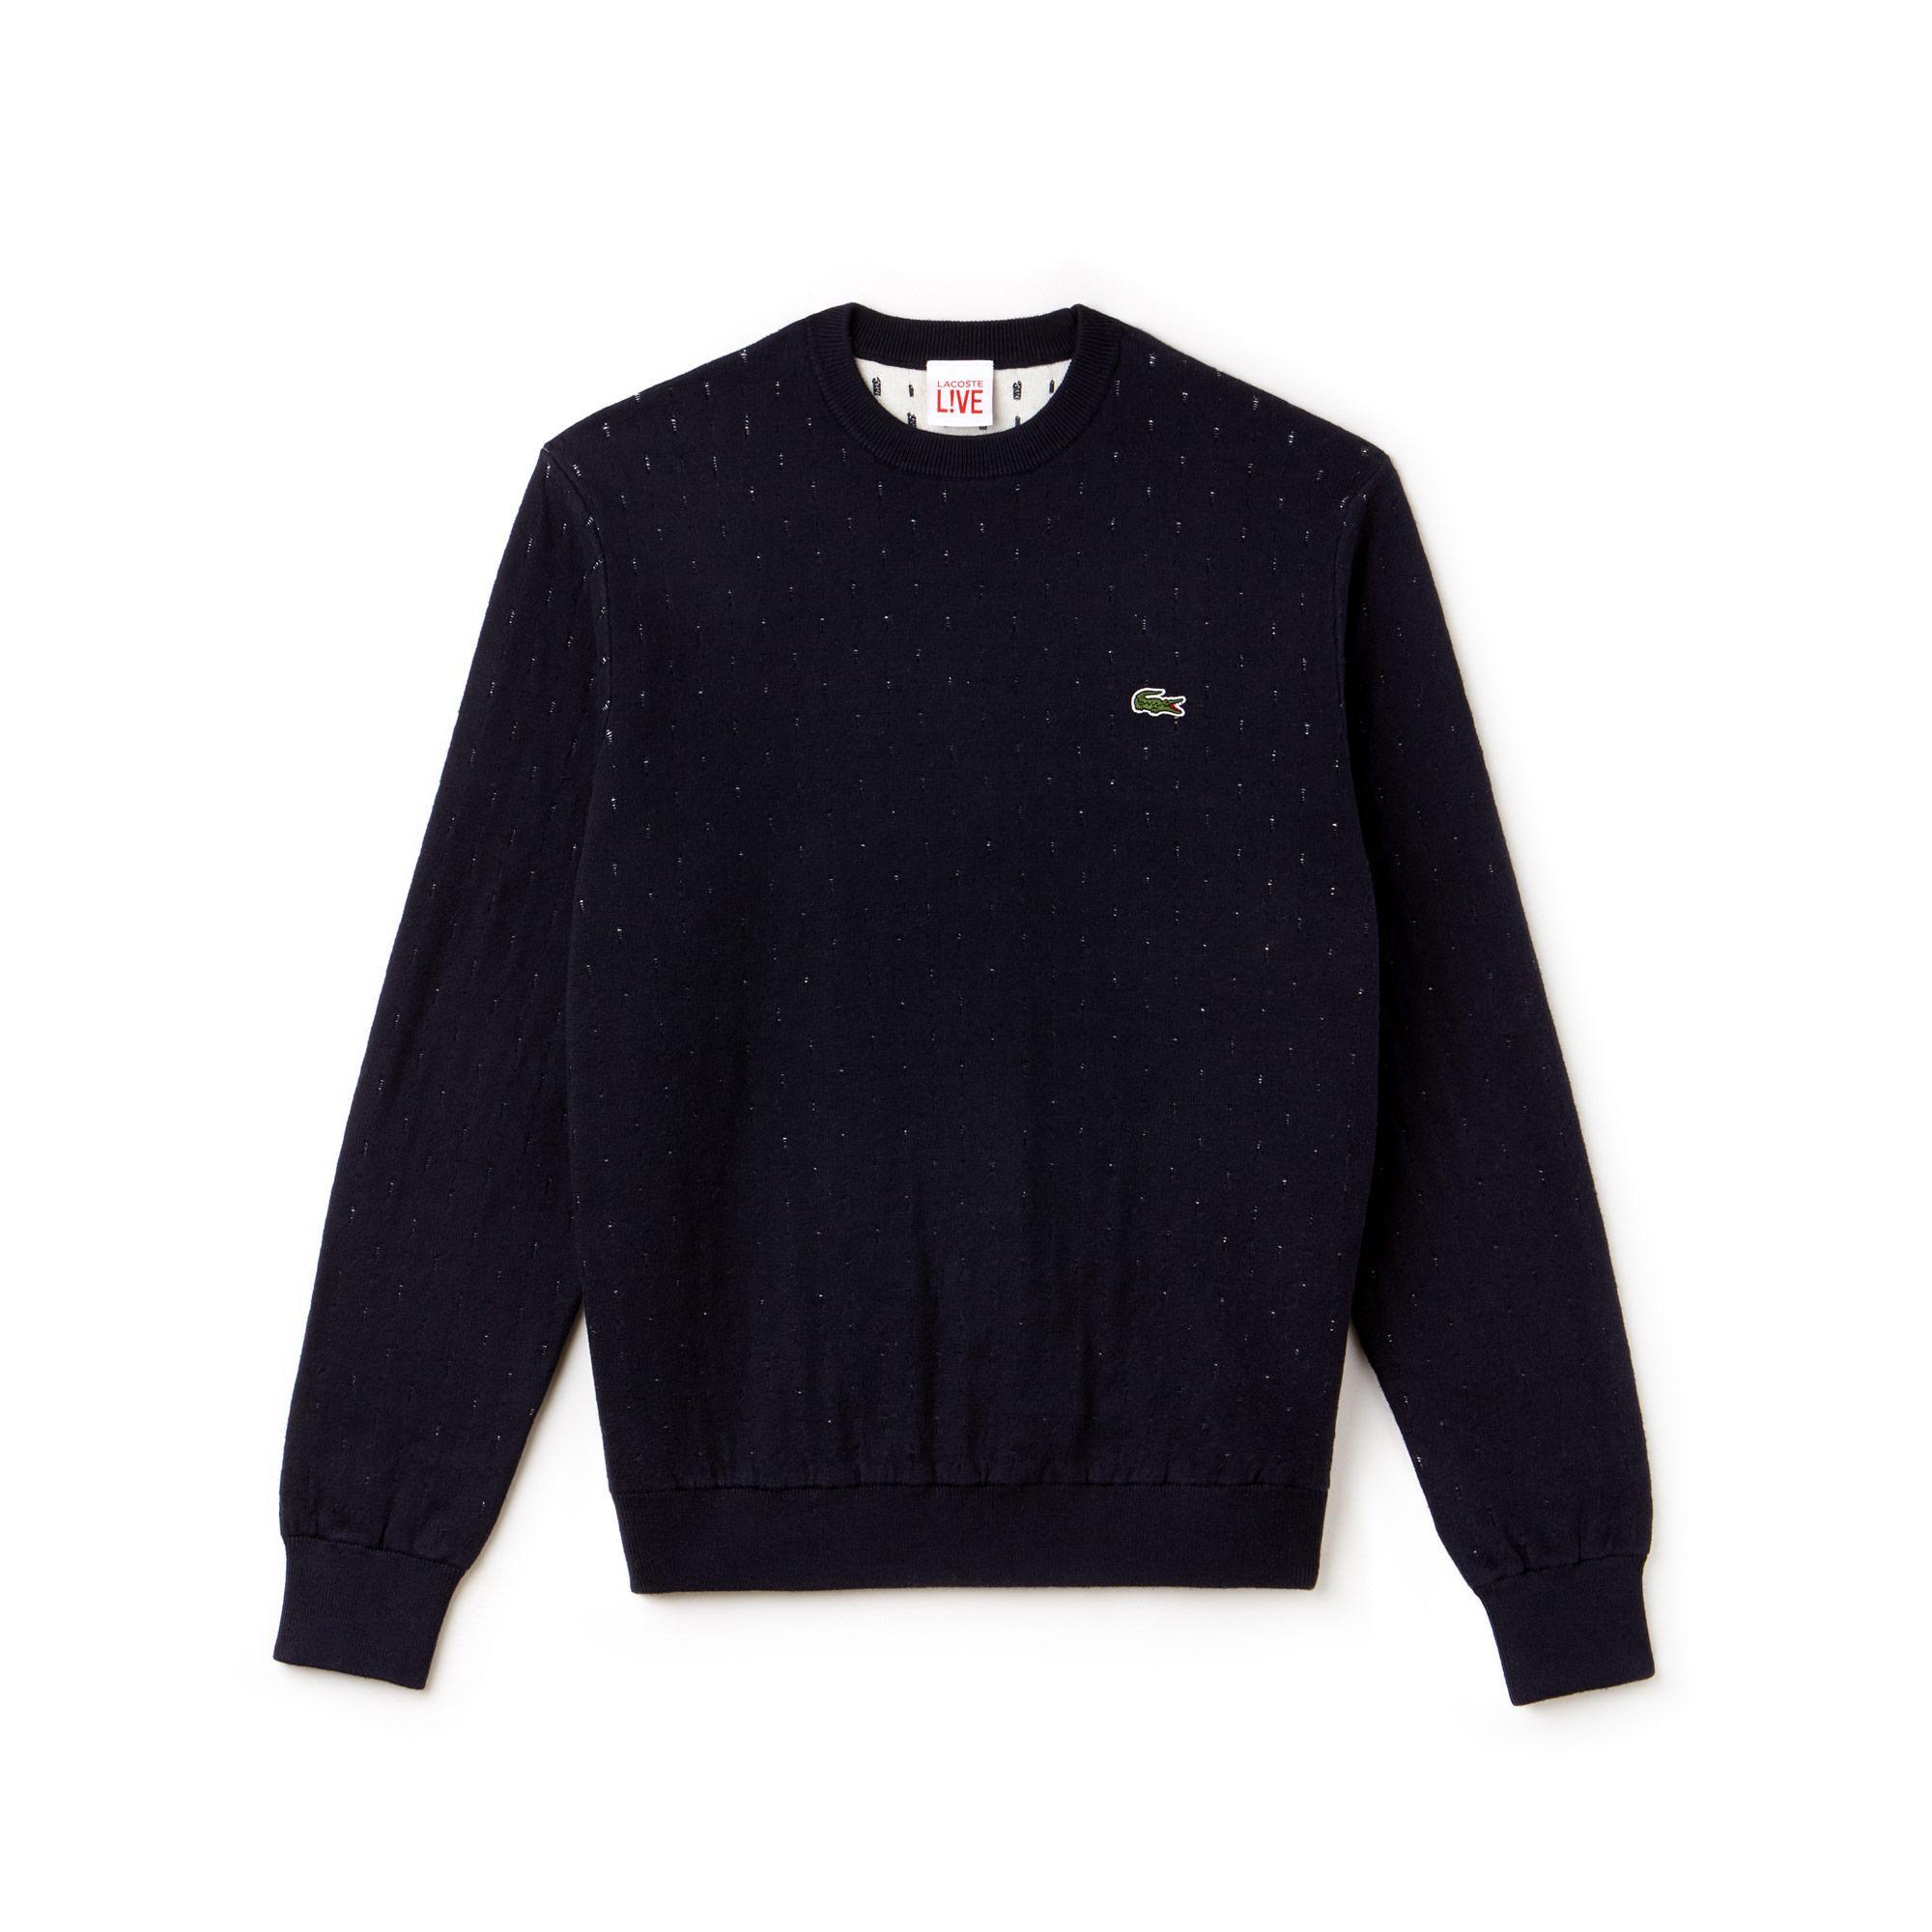 Lacoste L!VE Men's Sweater